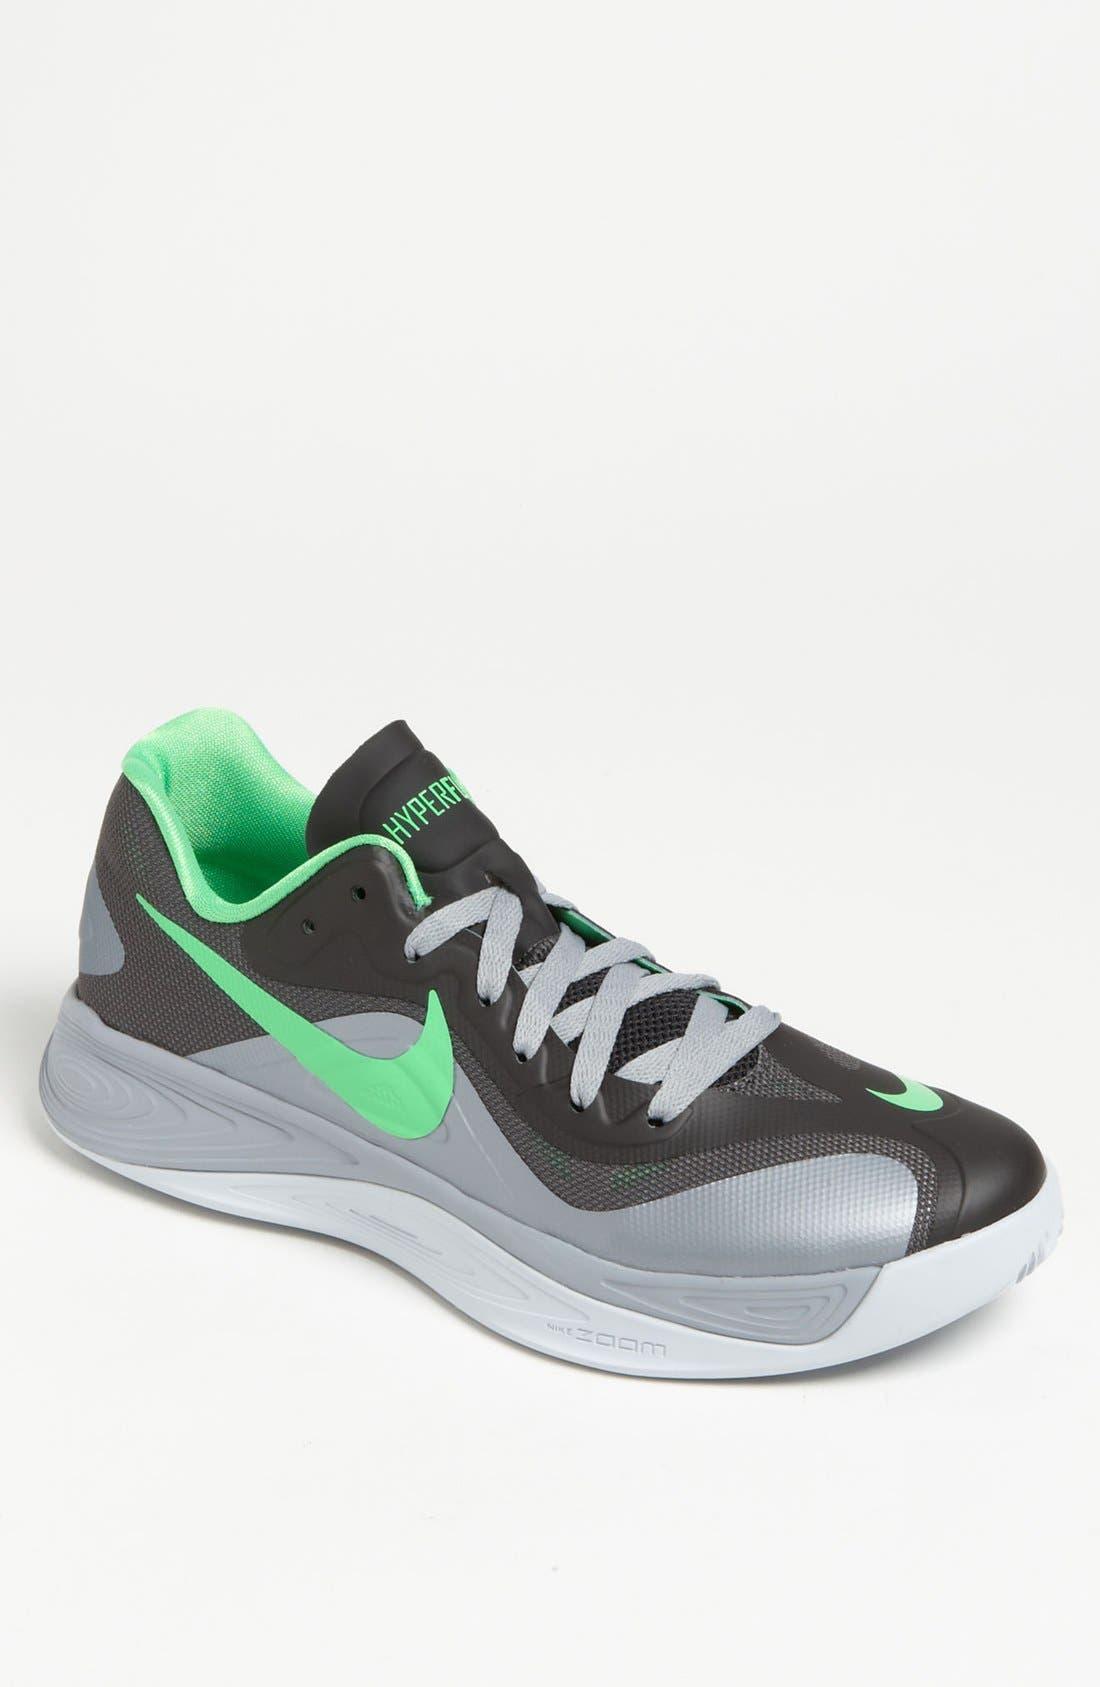 NIKE,                             'Hyperfuse Low' Basketball Shoe,                             Main thumbnail 1, color,                             004